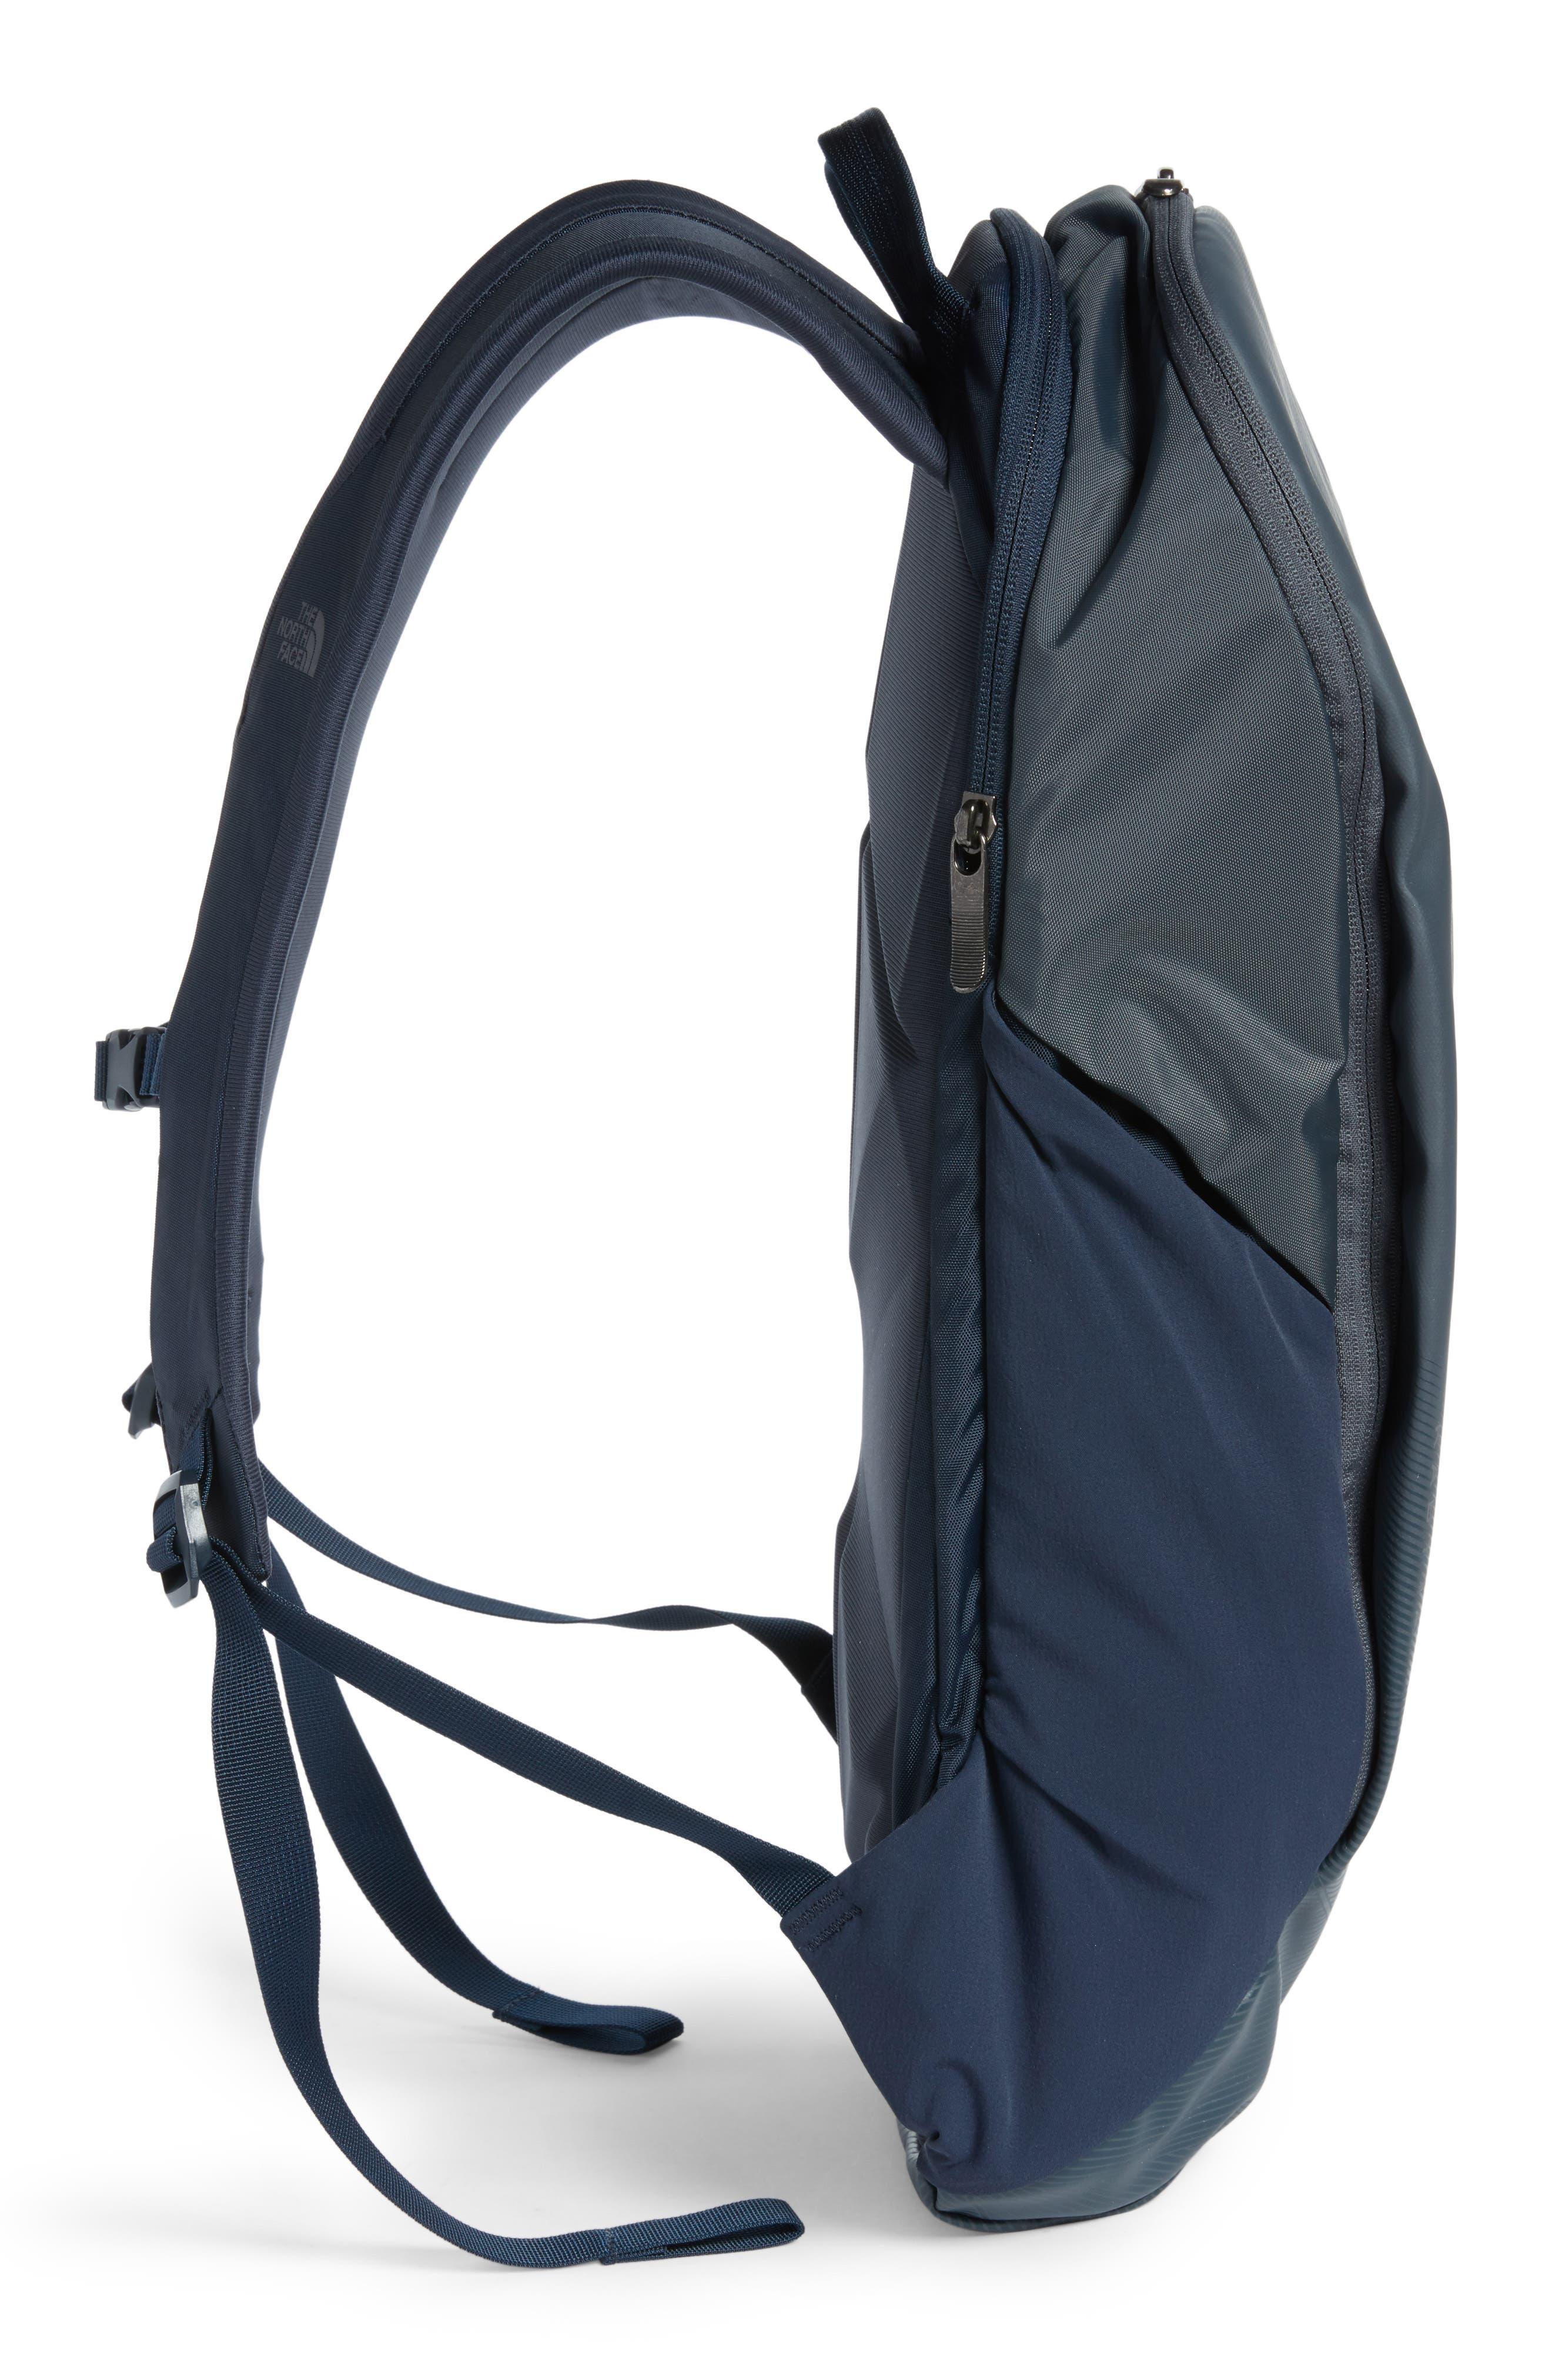 Kabyte Backpack,                             Alternate thumbnail 5, color,                             VANADIS GREY/ URBAN NAVY